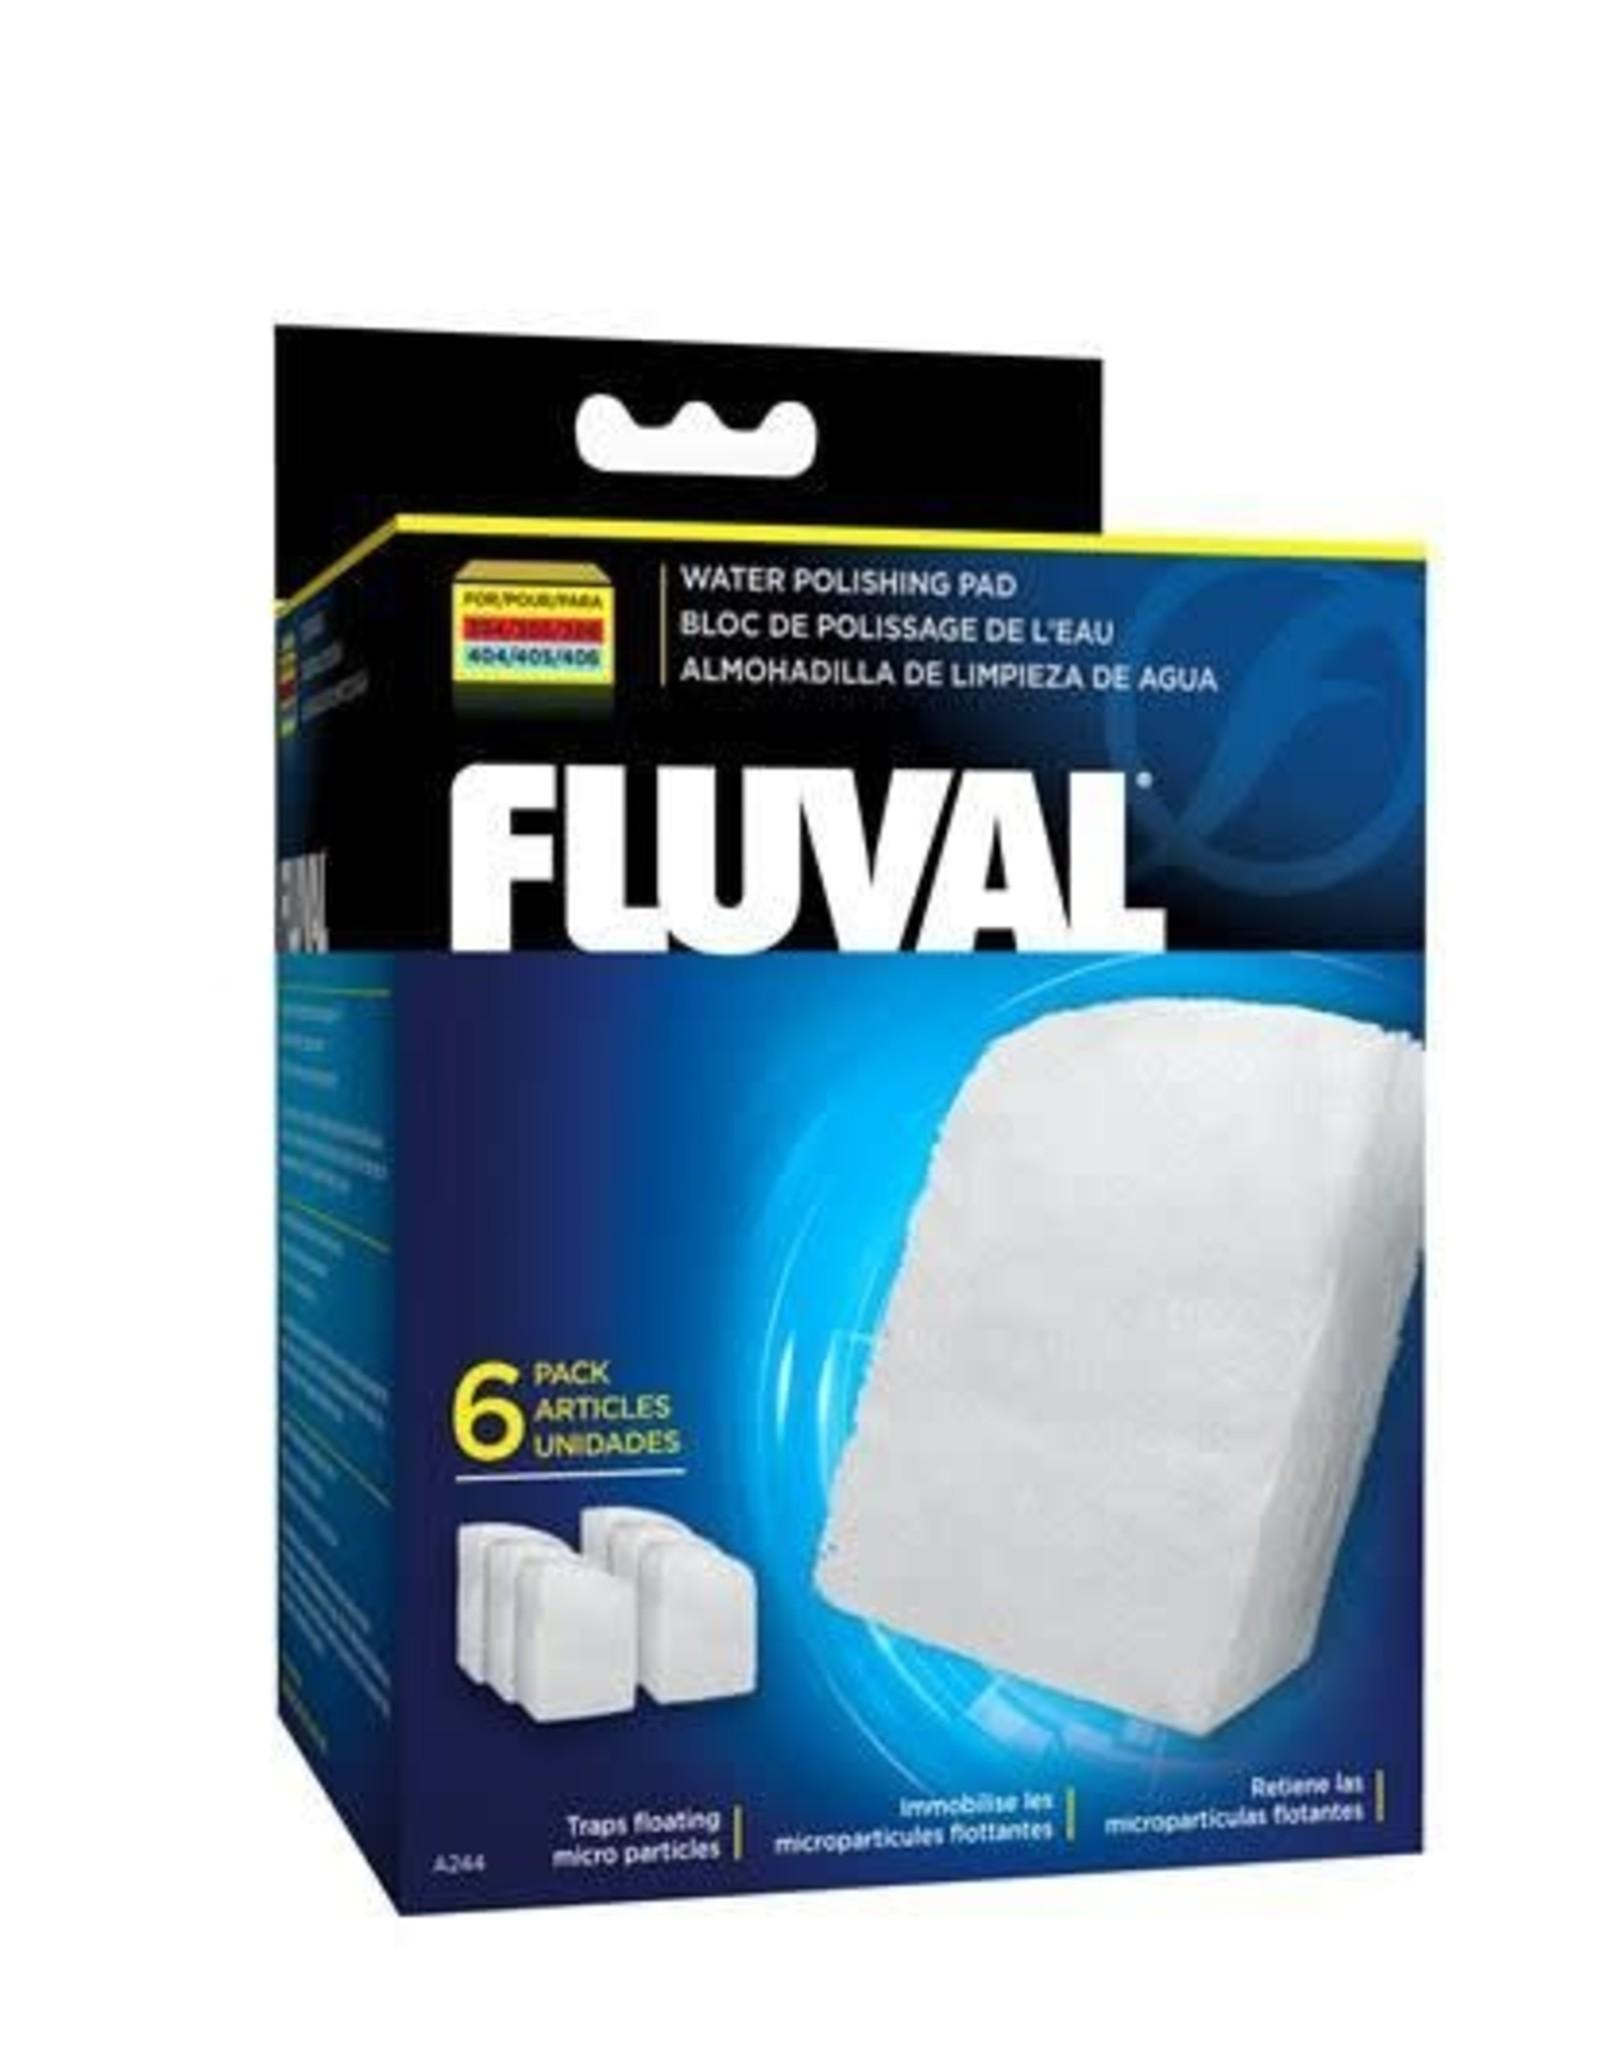 Fluval Fluval Water Polishing Pad, Fits 304/305/404/405 Models (6/Pack)